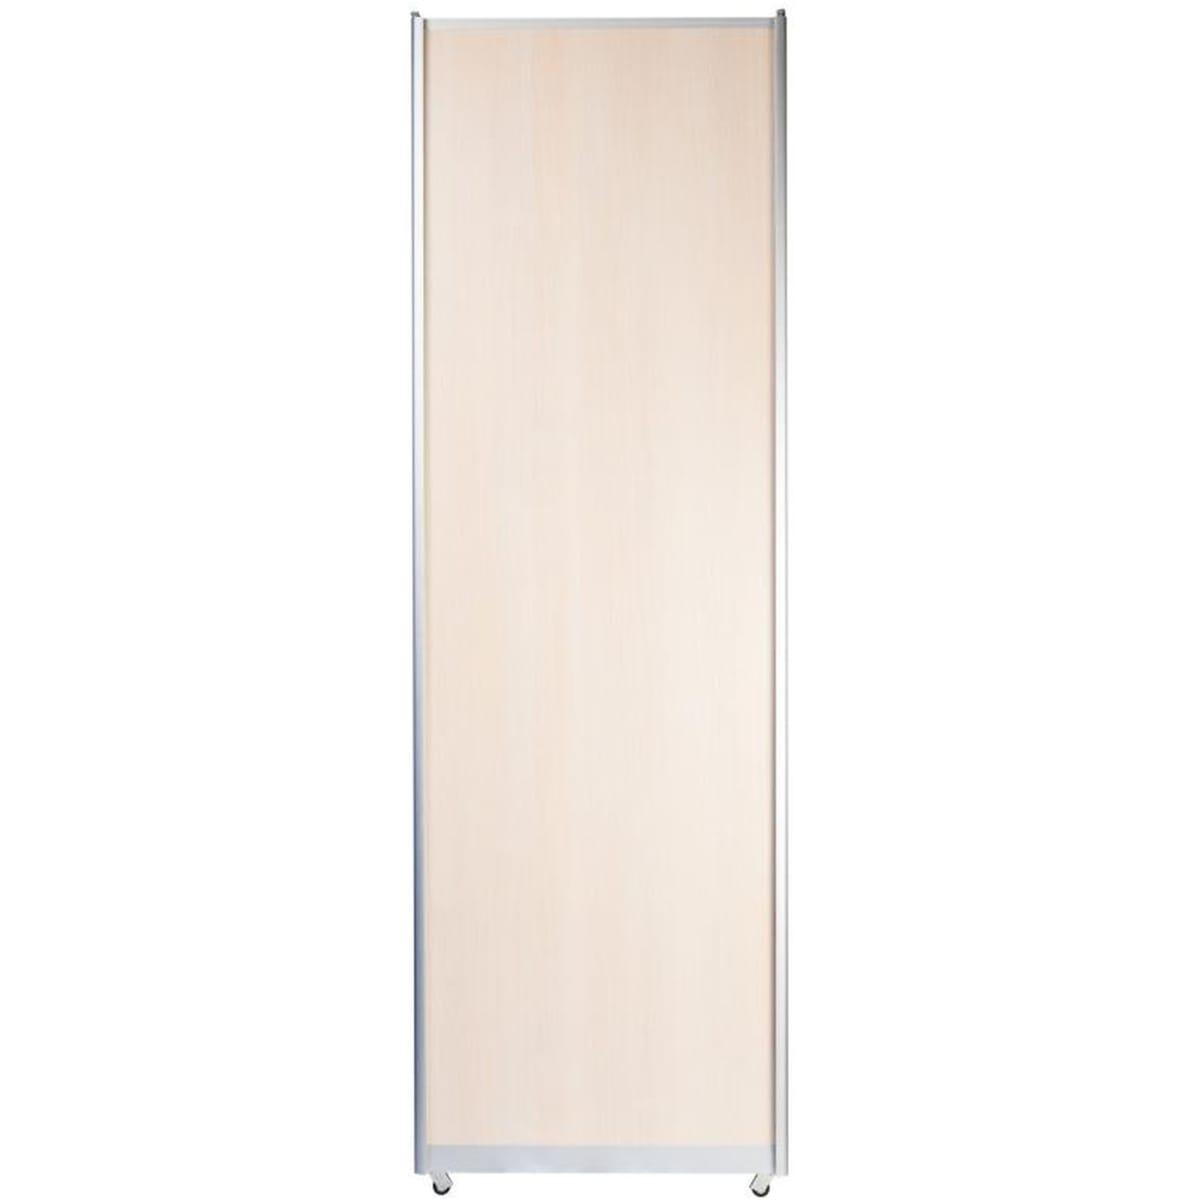 Дверь-купе Spaceo 2255x604 мм, цвет дуб беленый